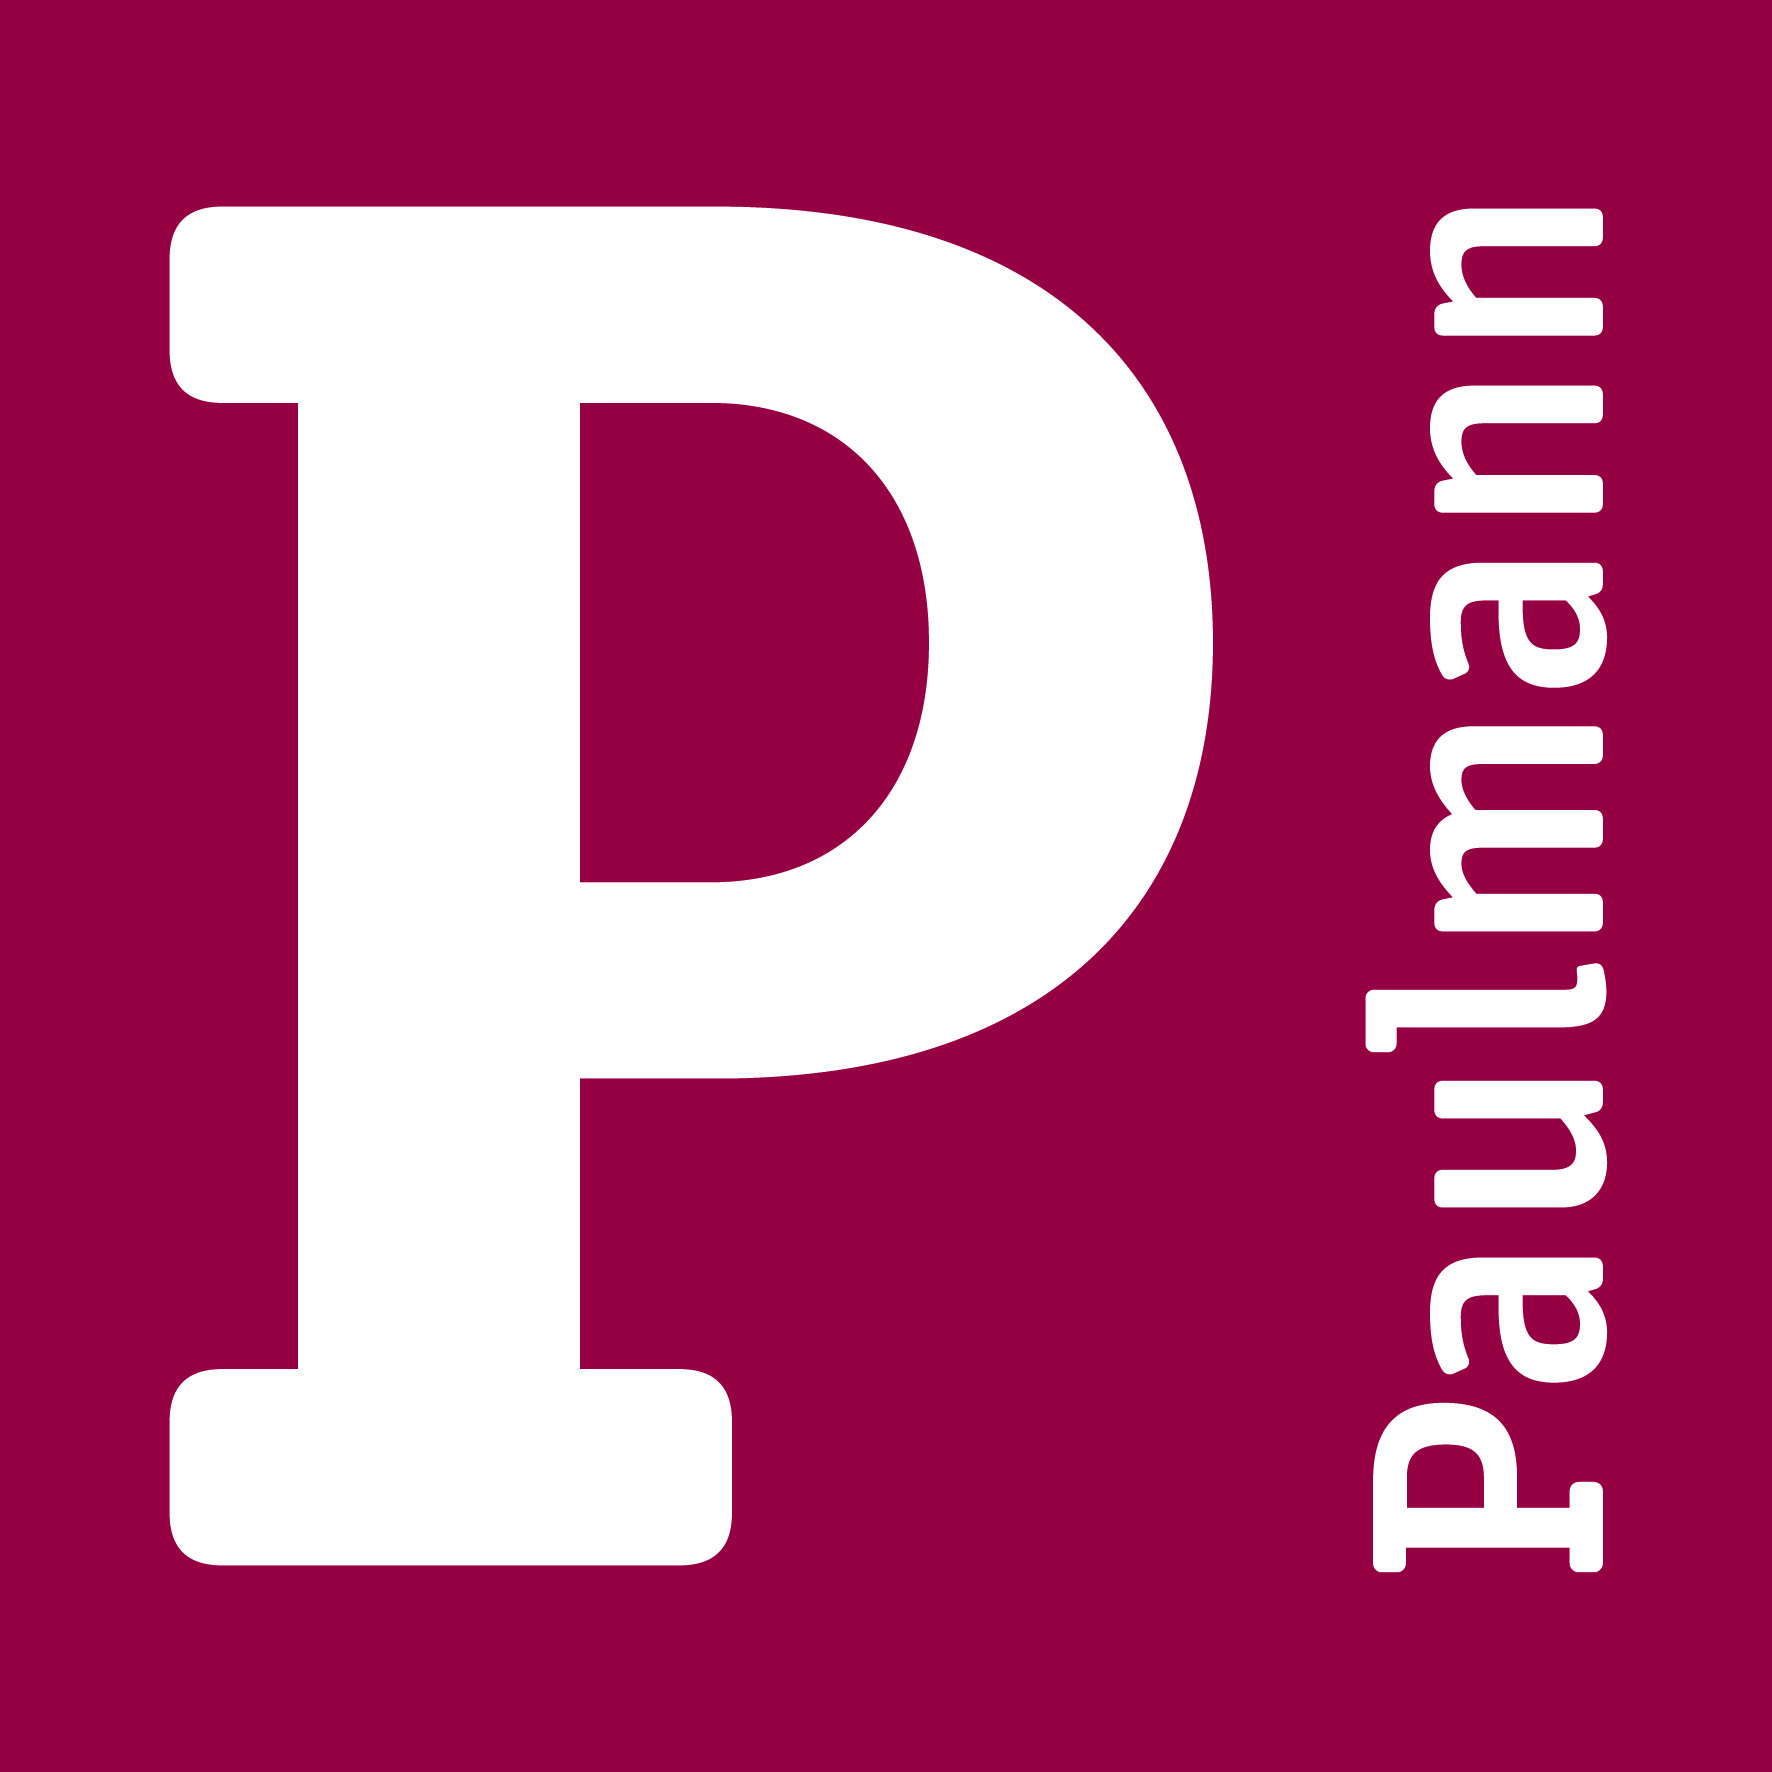 Paulmann Logo photo - 1